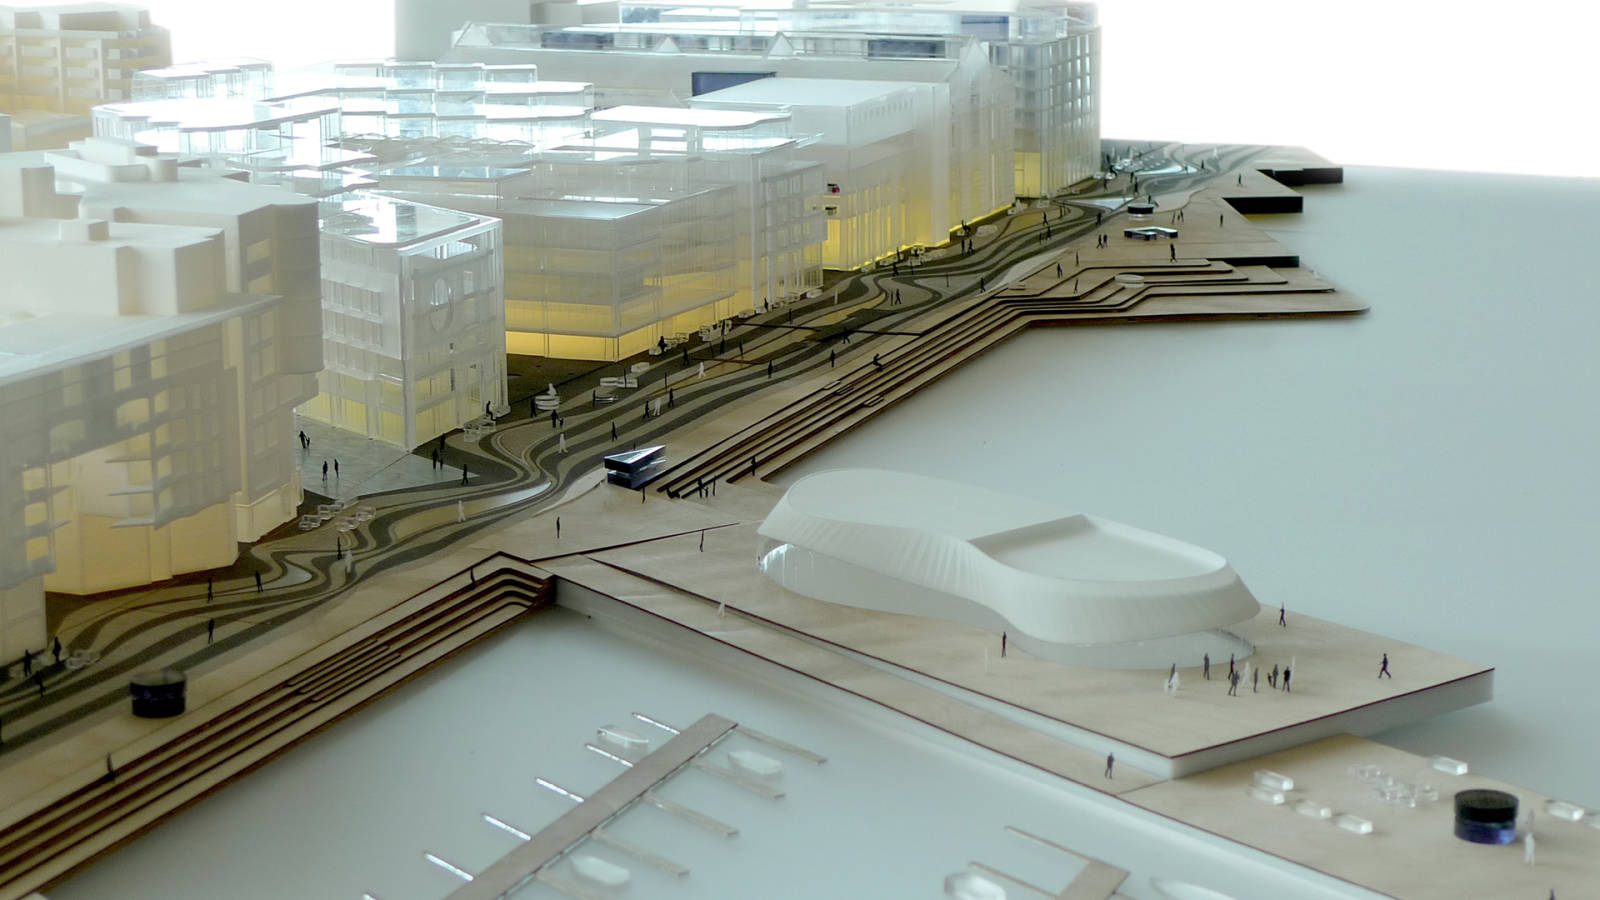 MARINA - Aker Brygge Masterplan - SPOL Architects